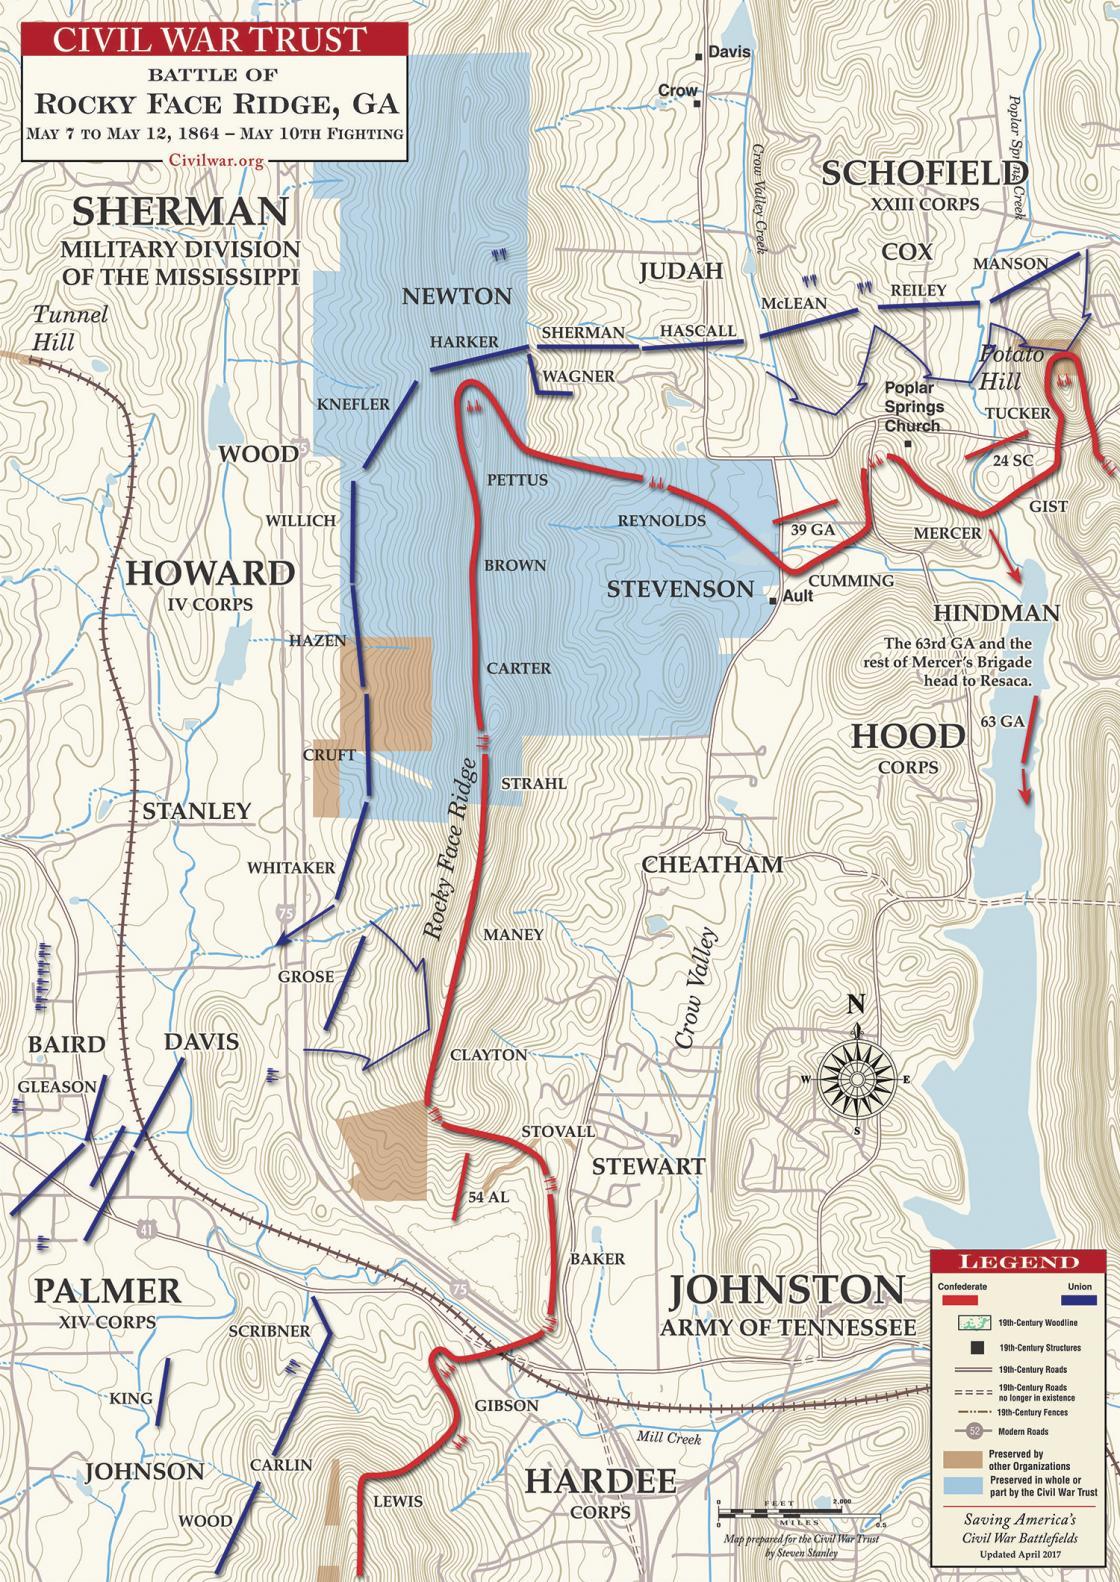 Battle of Rocky Face Ridge - May 10, 1864